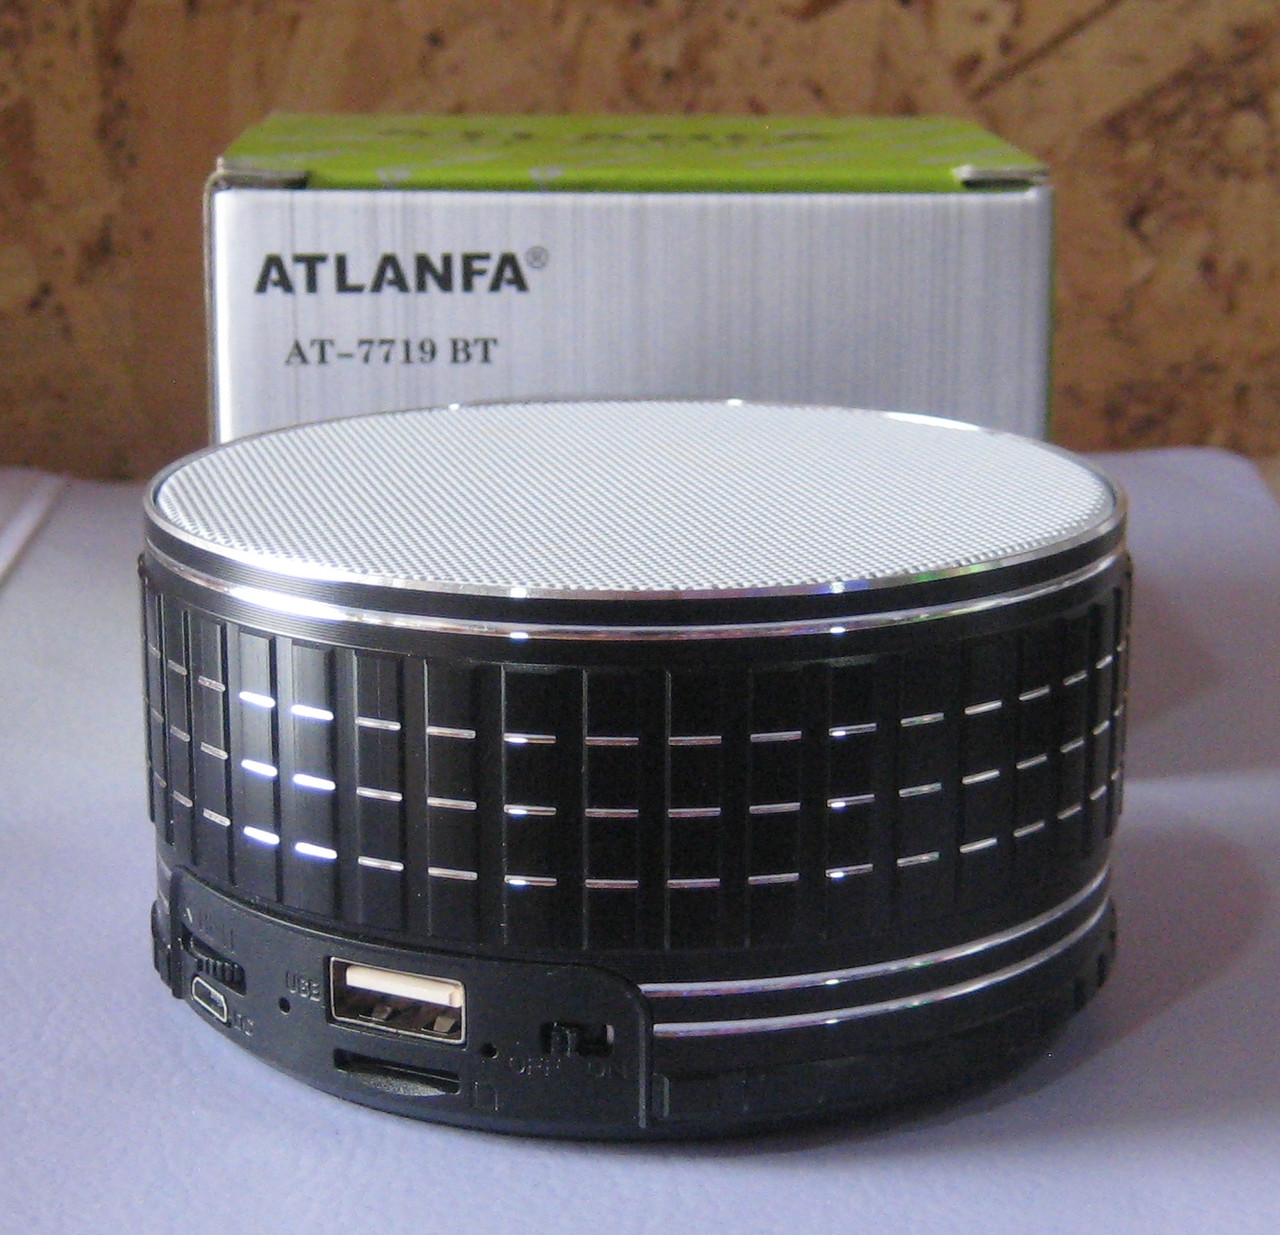 Портативна колонка Atlanfa AT-7719 BT (Bluetooth, USB, SD, FM)